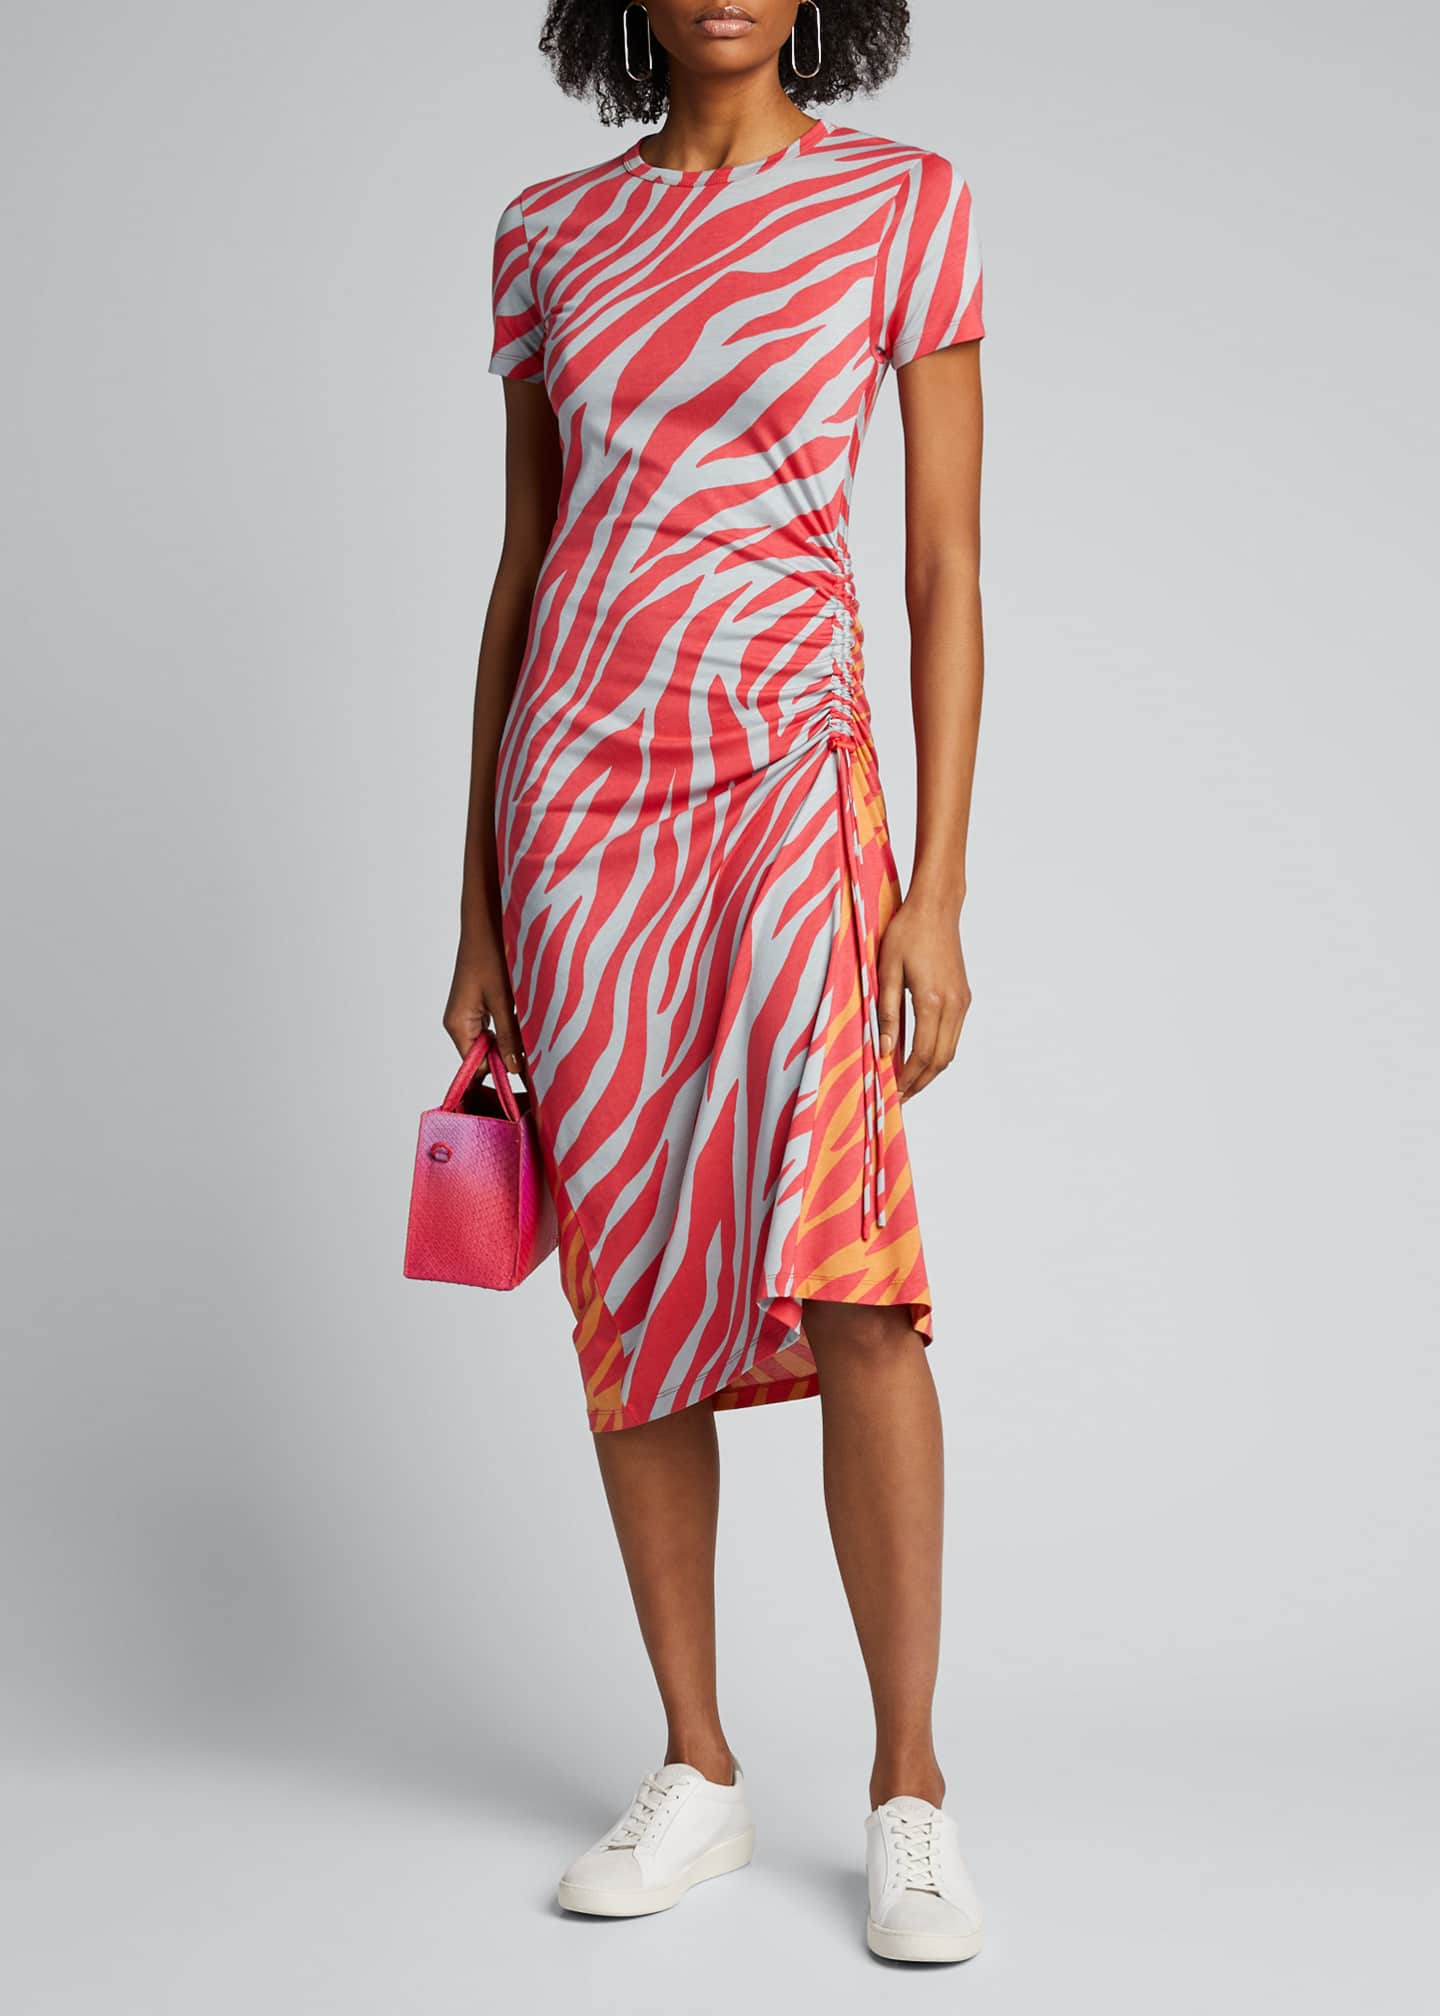 Rag & Bone Ina Tiger-Stripe Midi Dress